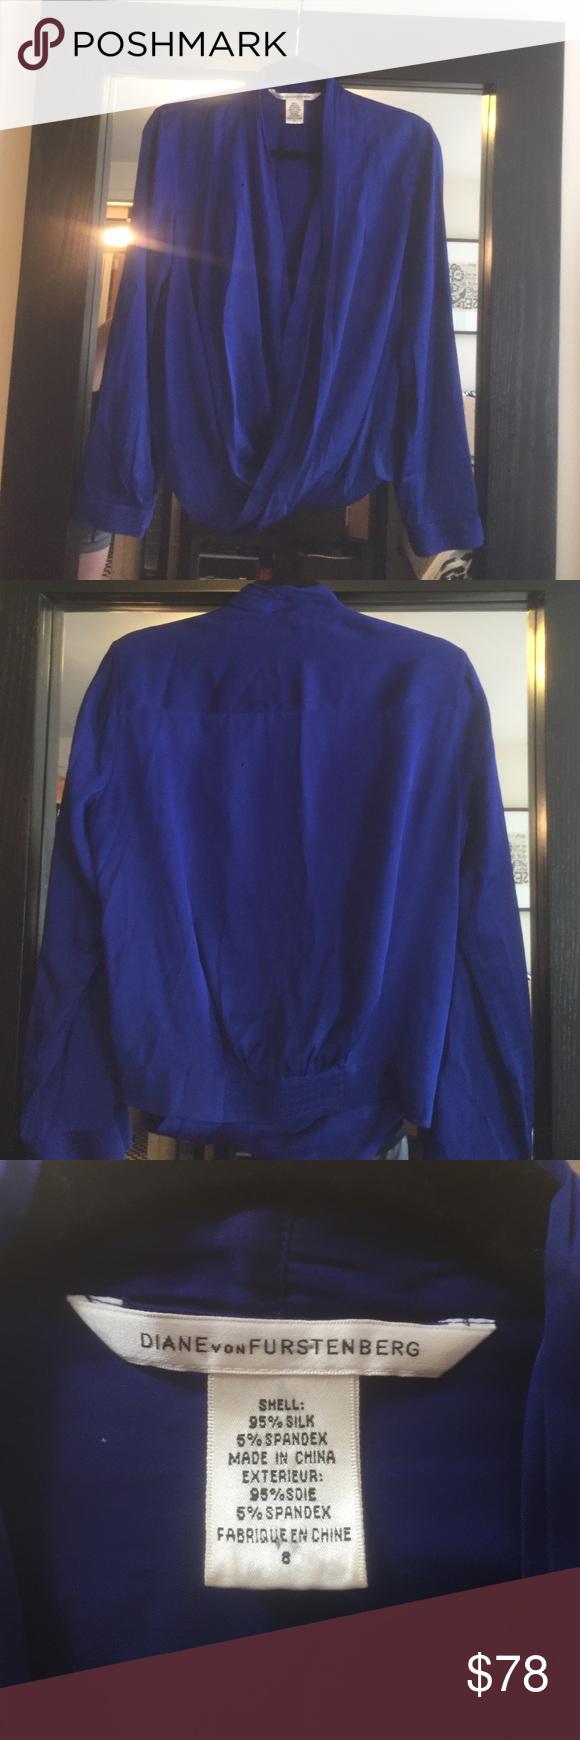 DVF Top Beautiful royal blue DVF silk top!  In great condition. Diane von Furstenberg Tops